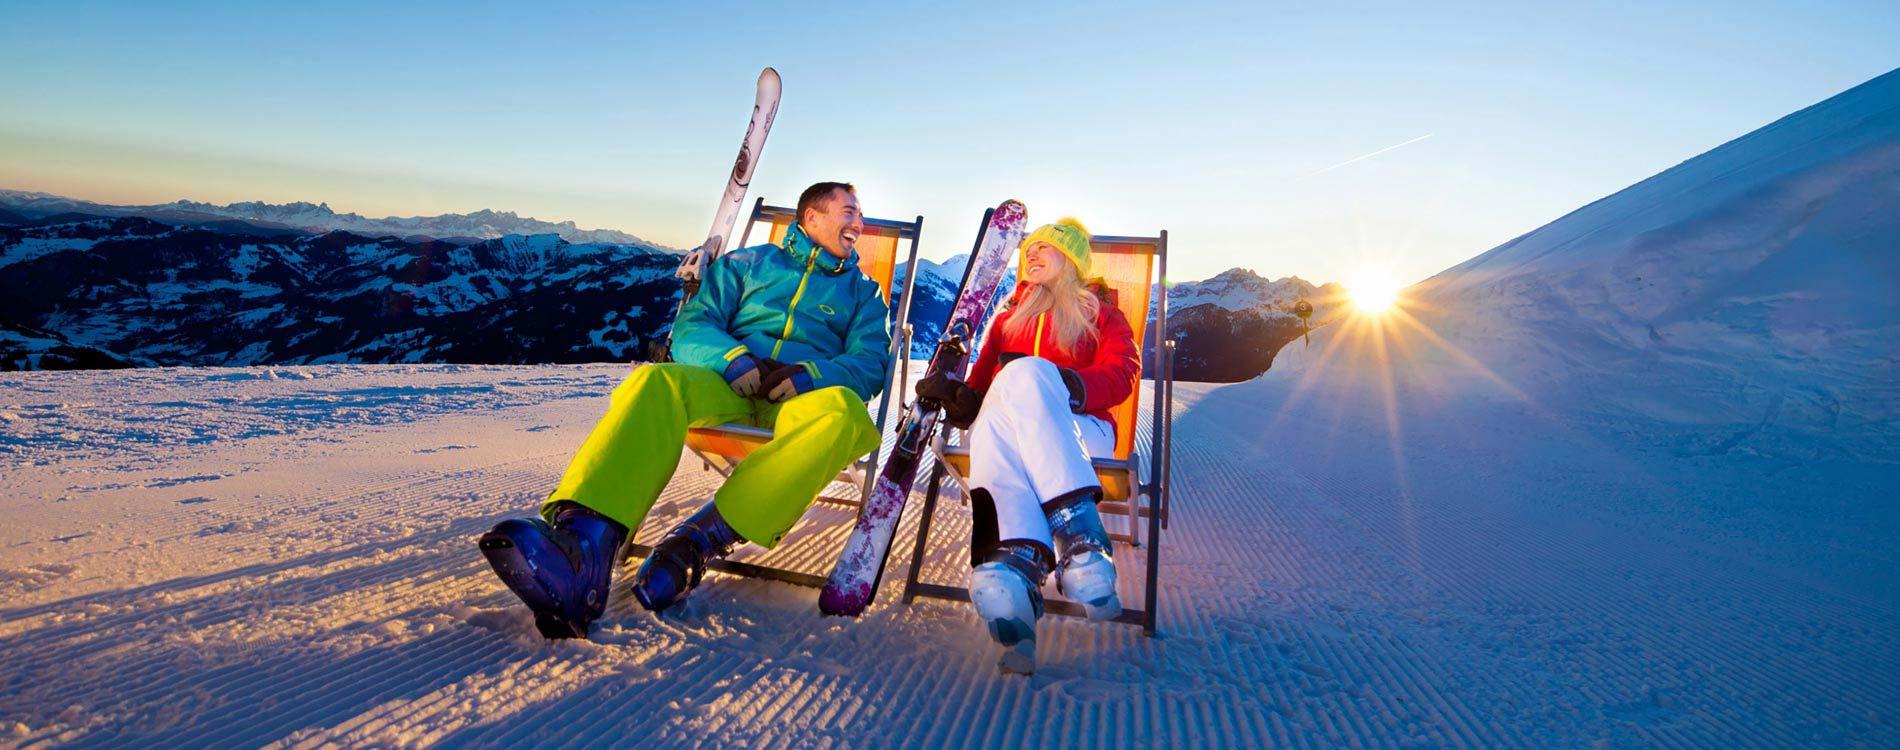 Easter skiing - Niche Destinations 4-star-superior hotel GROSSARLER HOF couple skiing at sunset